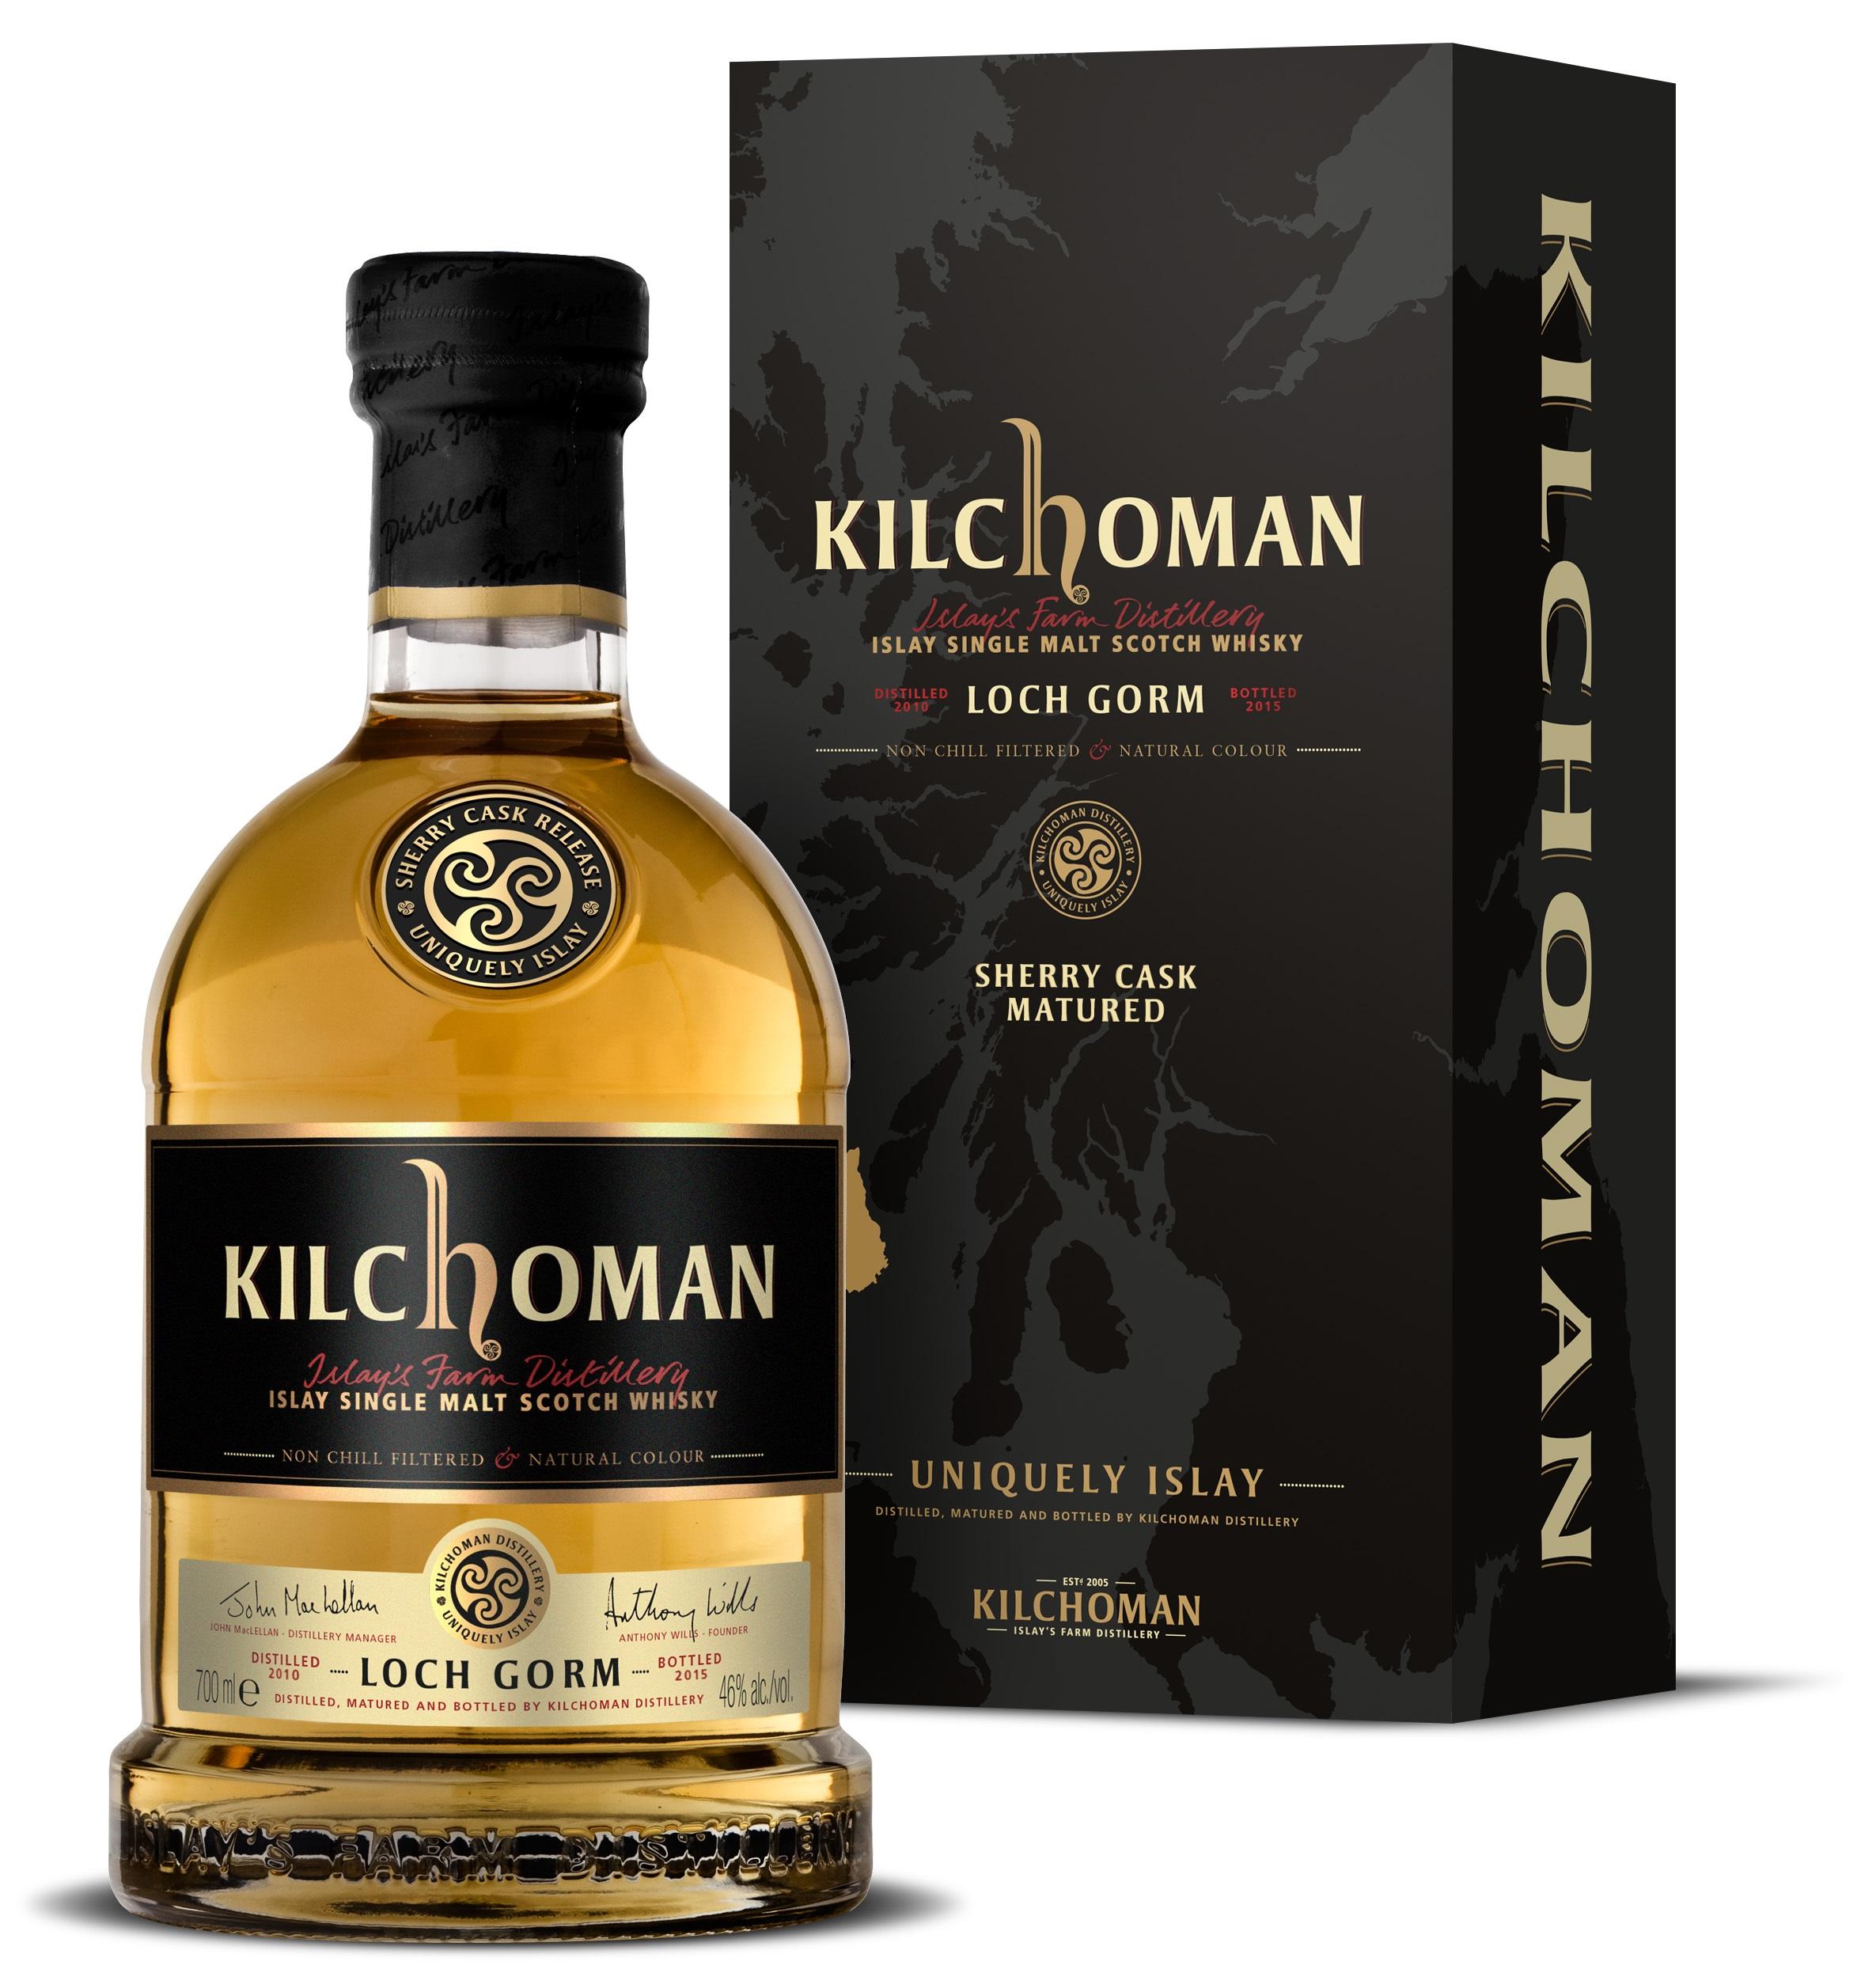 Image result for kilchoman loch gorm 2018